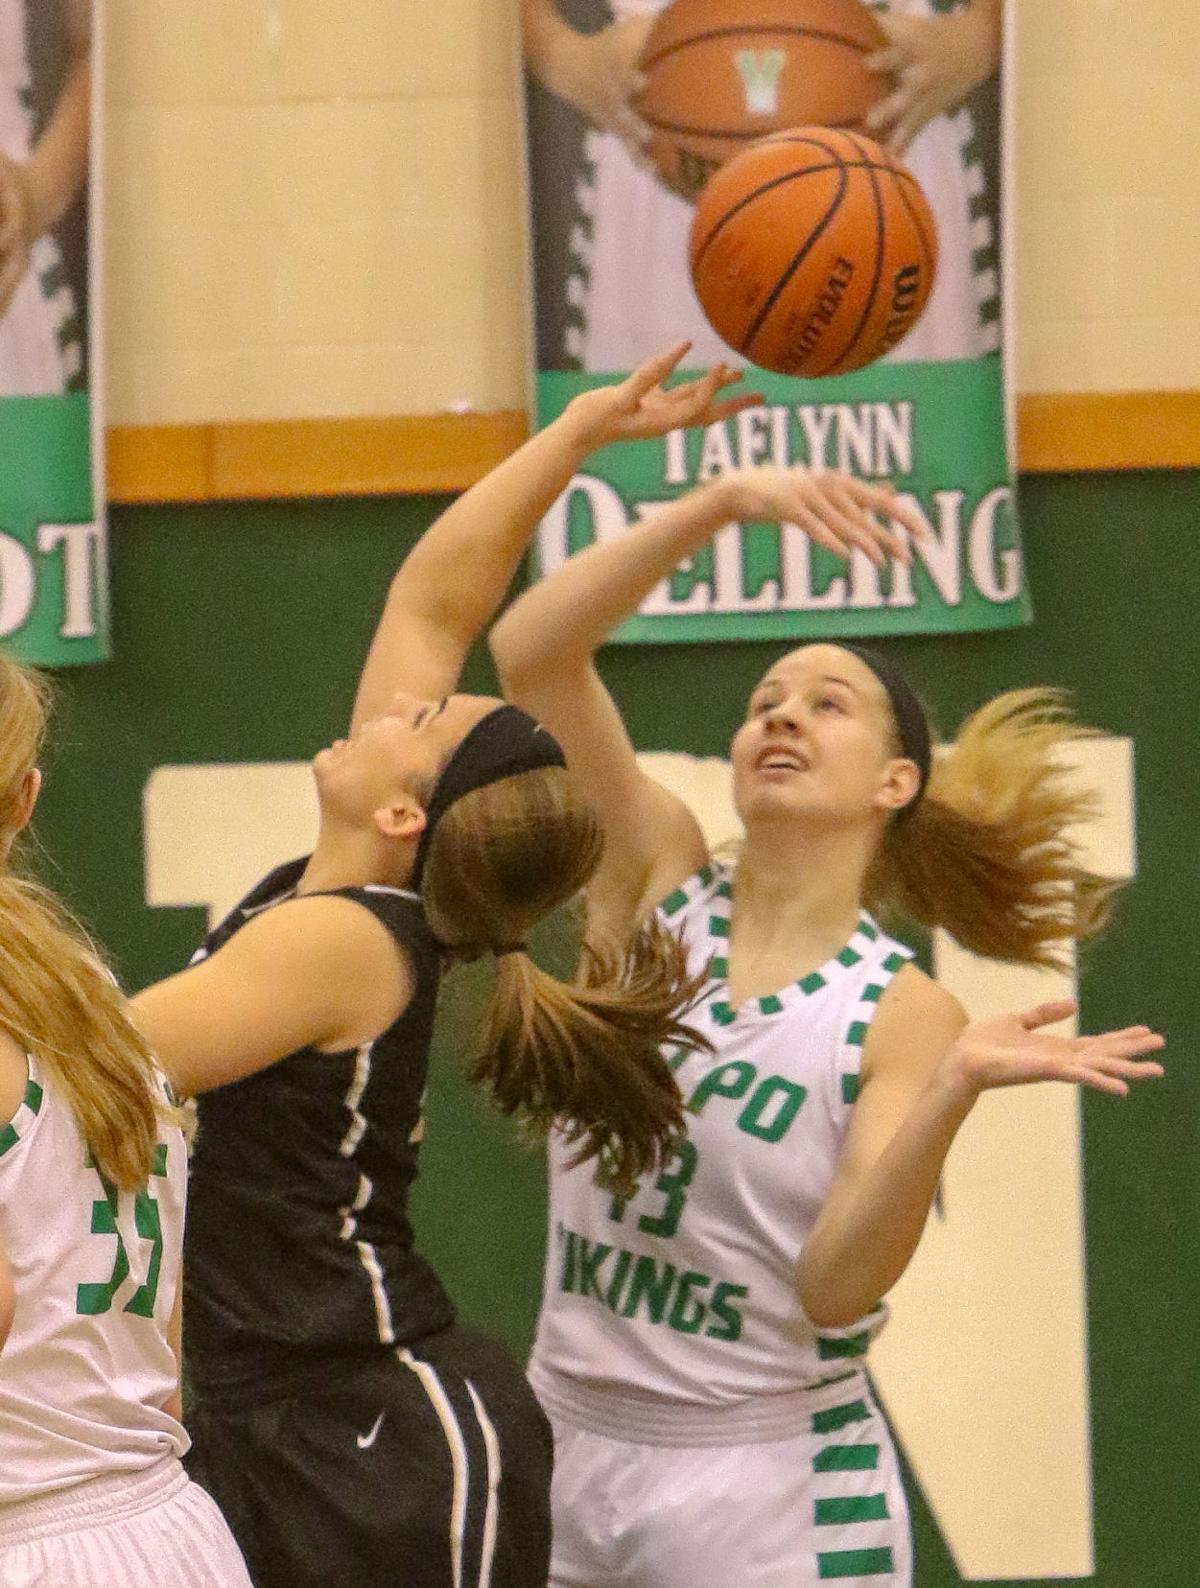 Penn at Valparaiso girls basketball